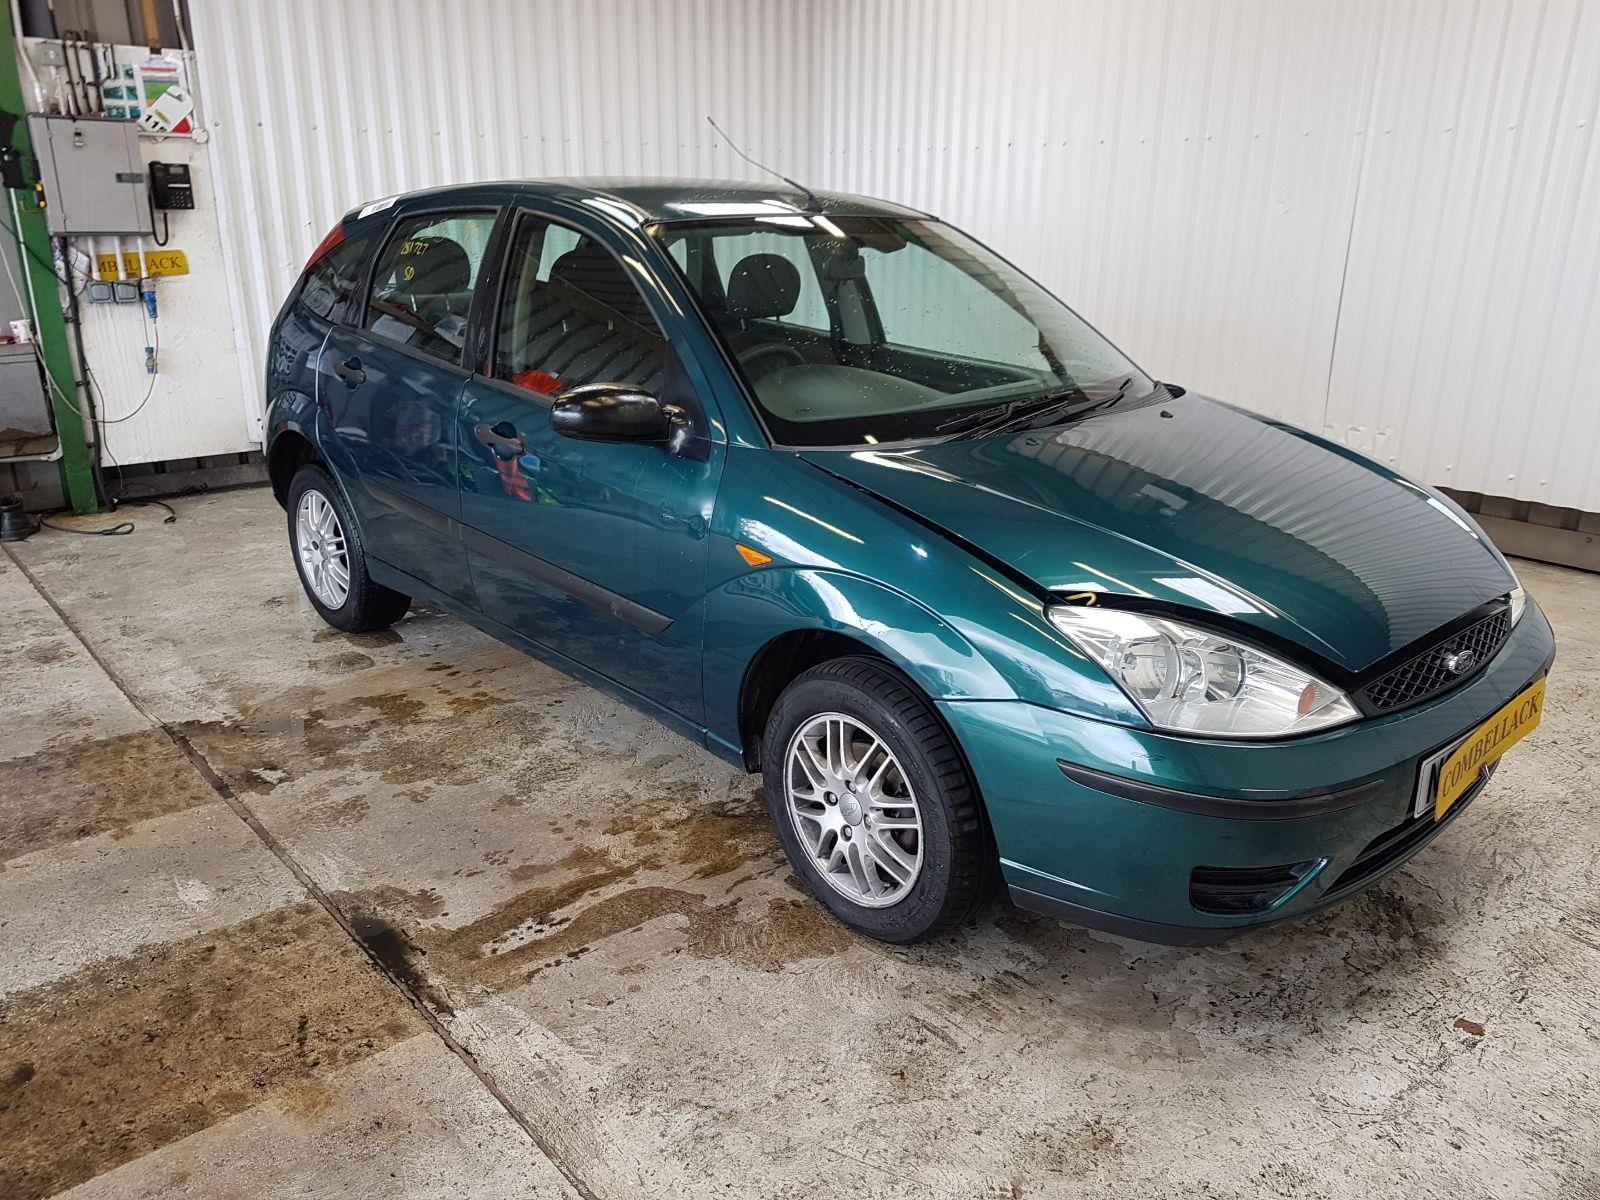 Ford Focus 1998 To 2005 LX (Sun Roof) 5 Door Hatchback